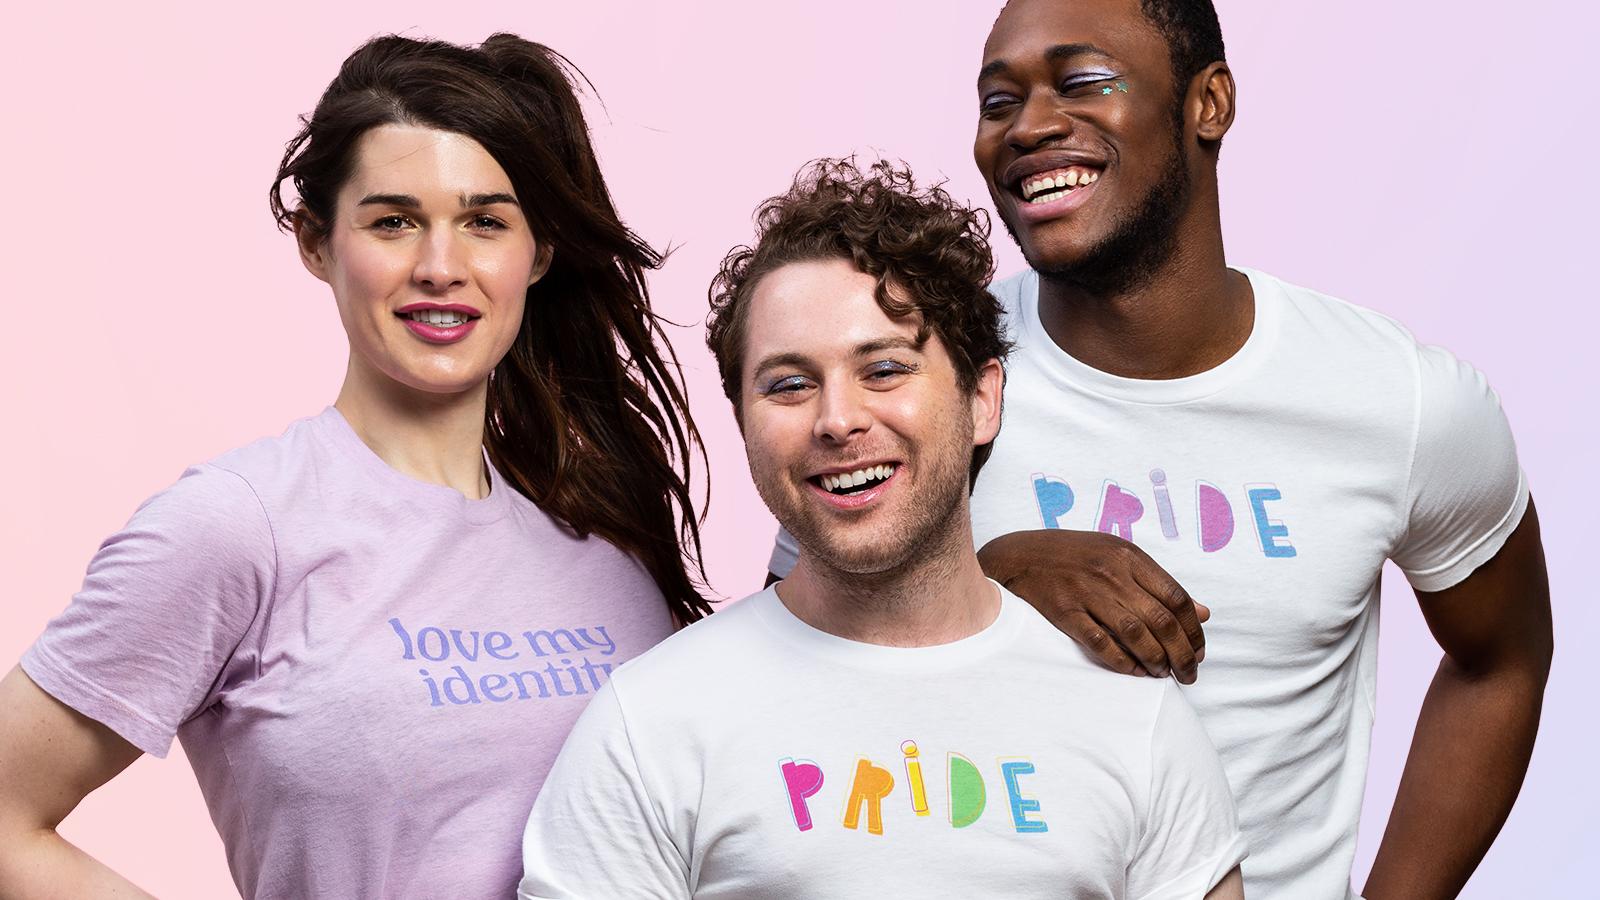 Alt Pronouns Pride